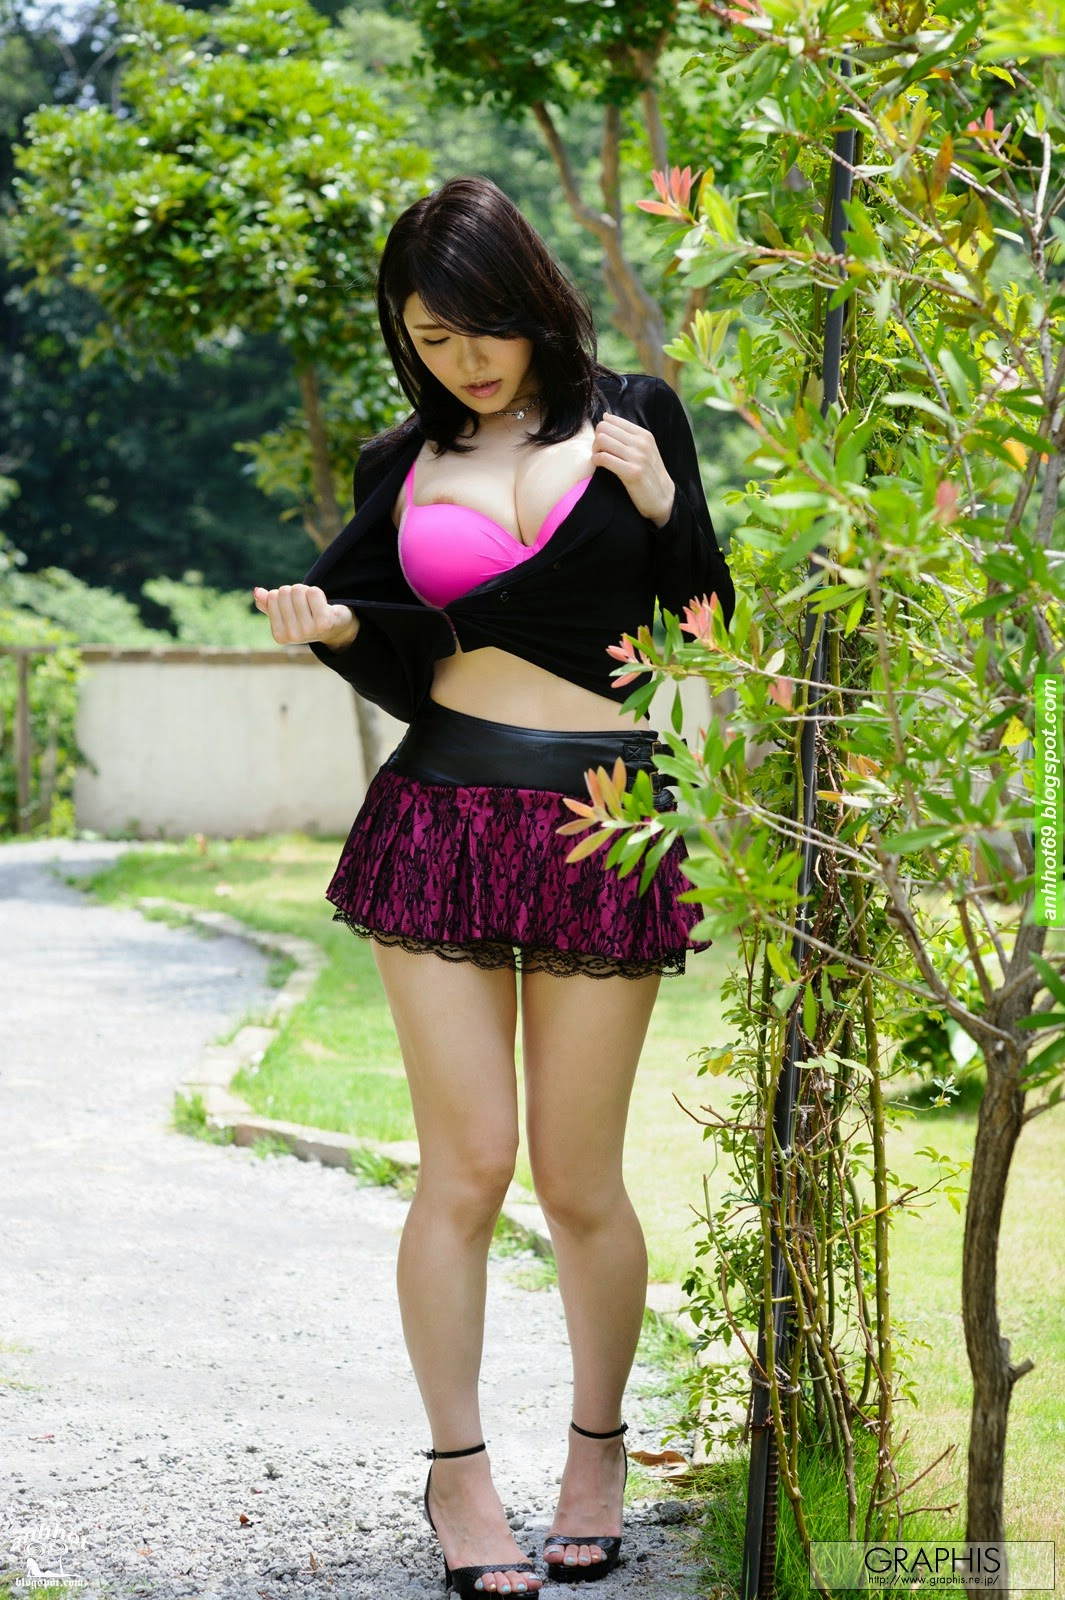 anri-okita-02298707